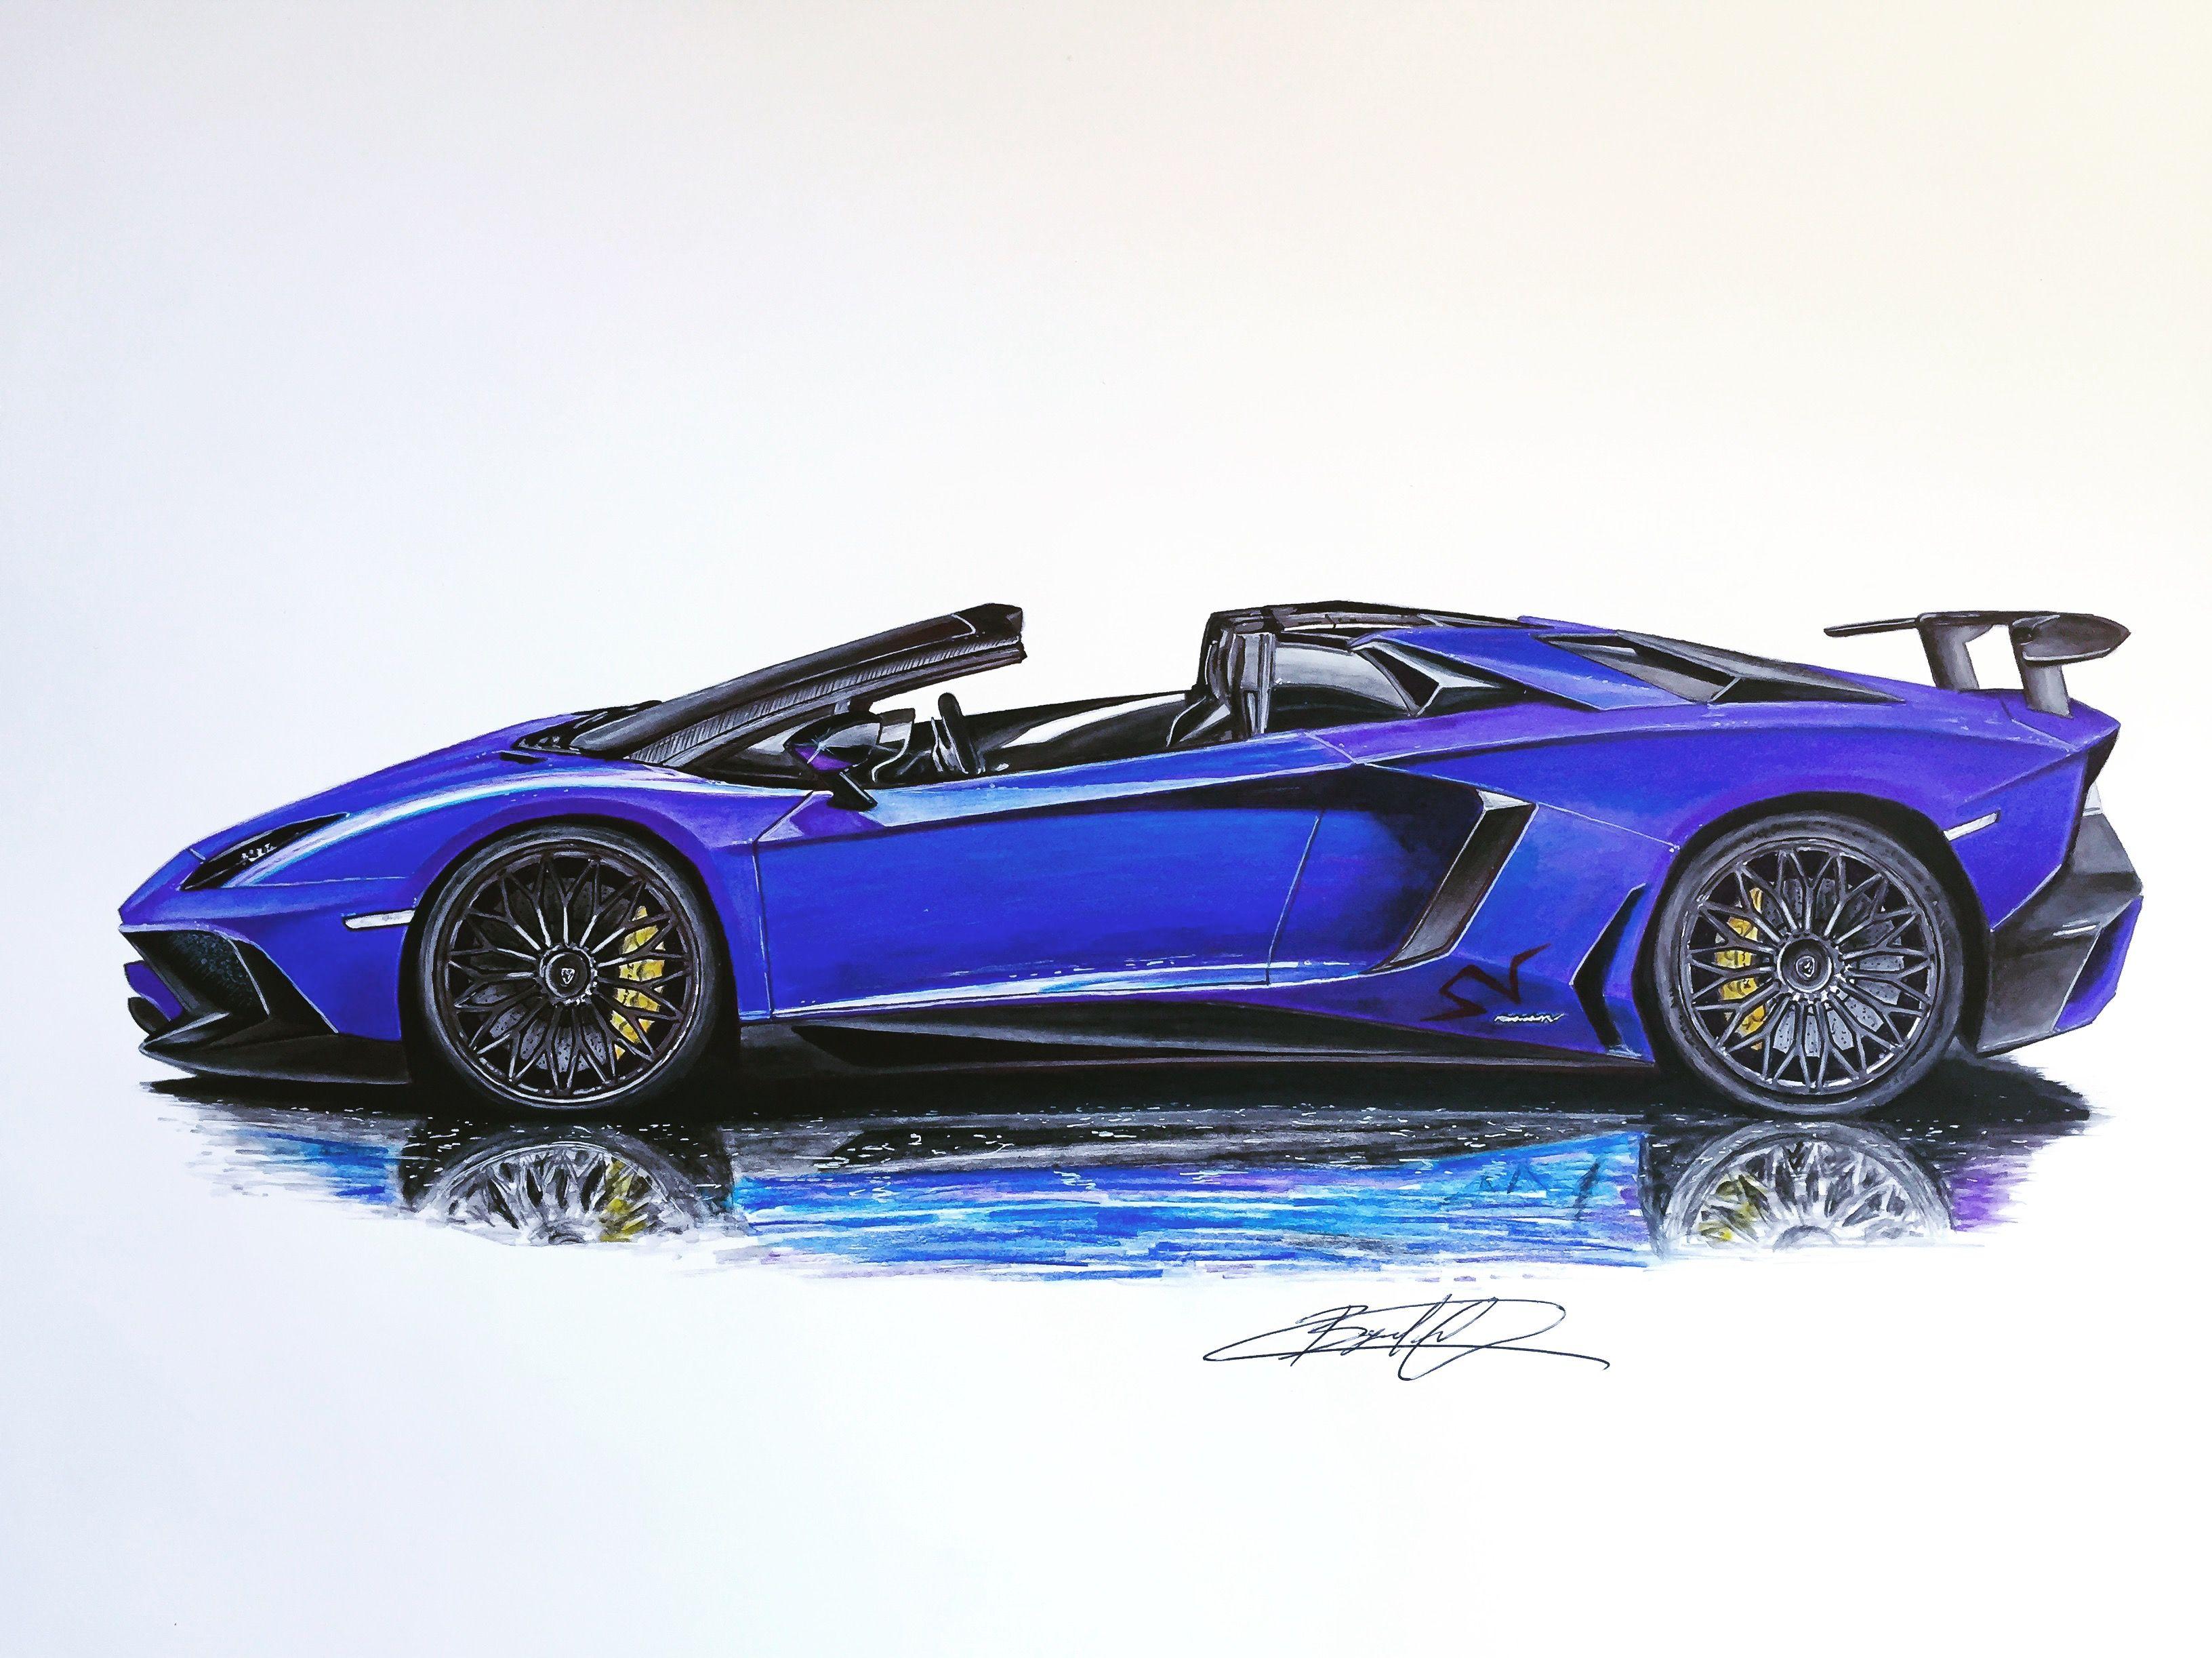 Lamborghini Aventador SV Roadster | Drawing Supercar by Filo | Pinterest